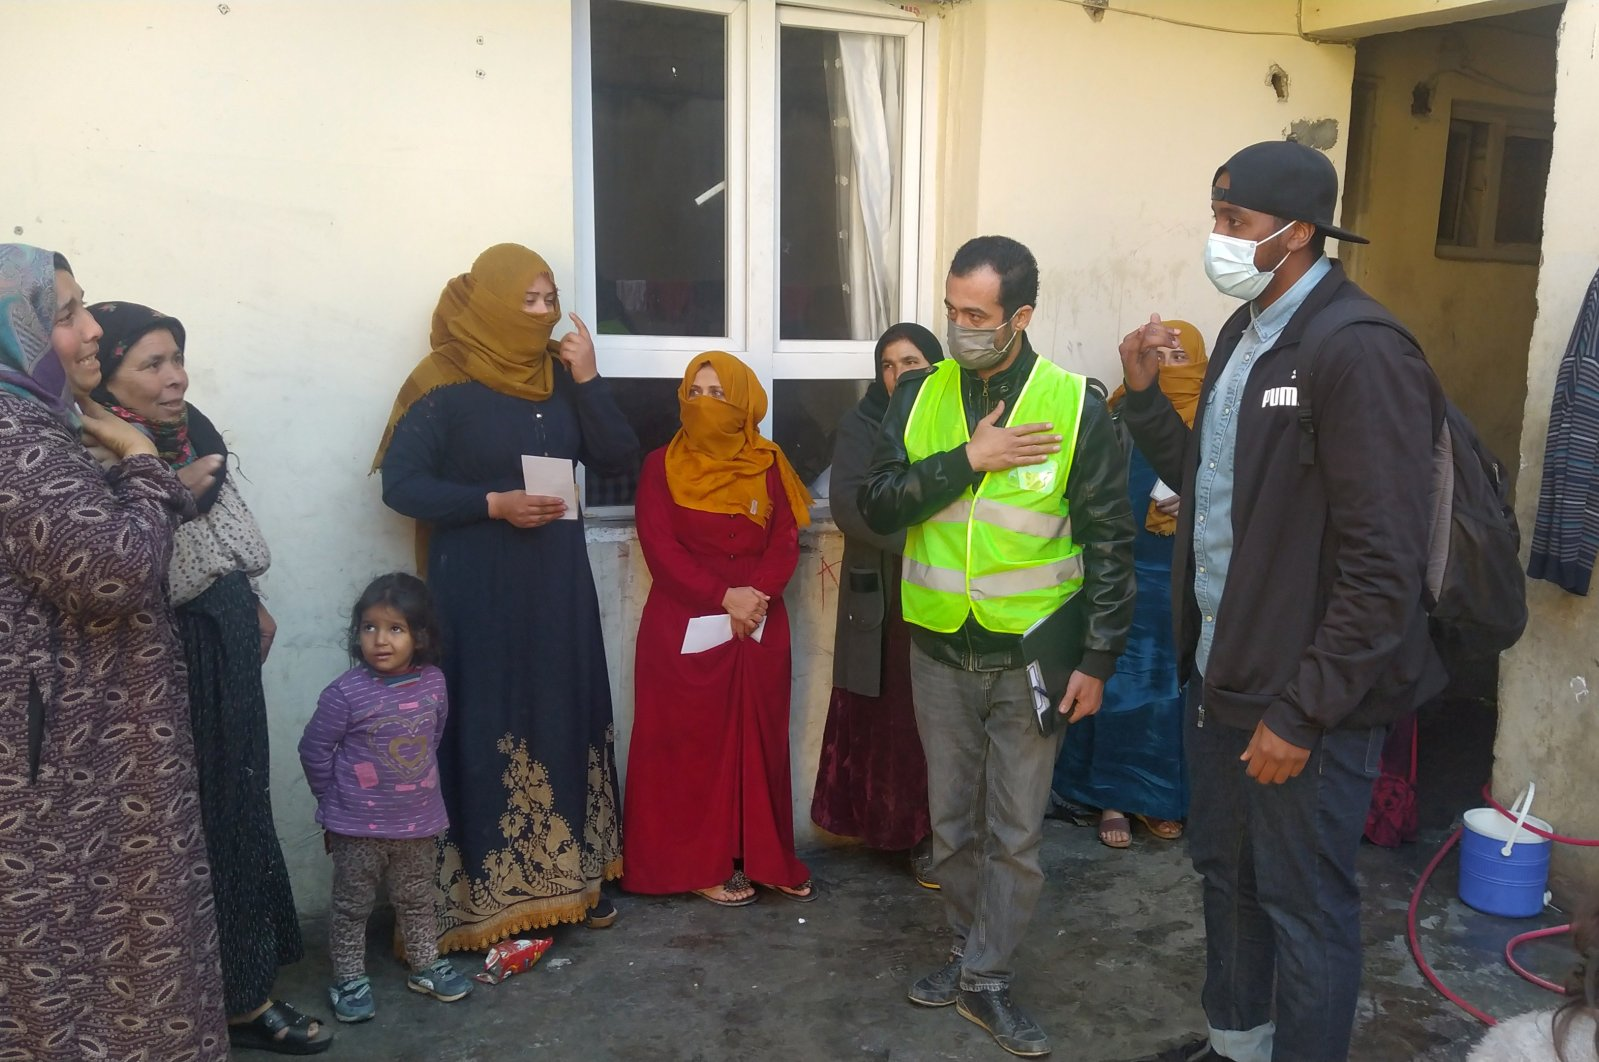 Taha Saleh (R) talks to Syrian refugees during a visit to their home, in Şanlıurfa, southeastern Turkey, Feb. 28, 2021. (İHA PHOTO)